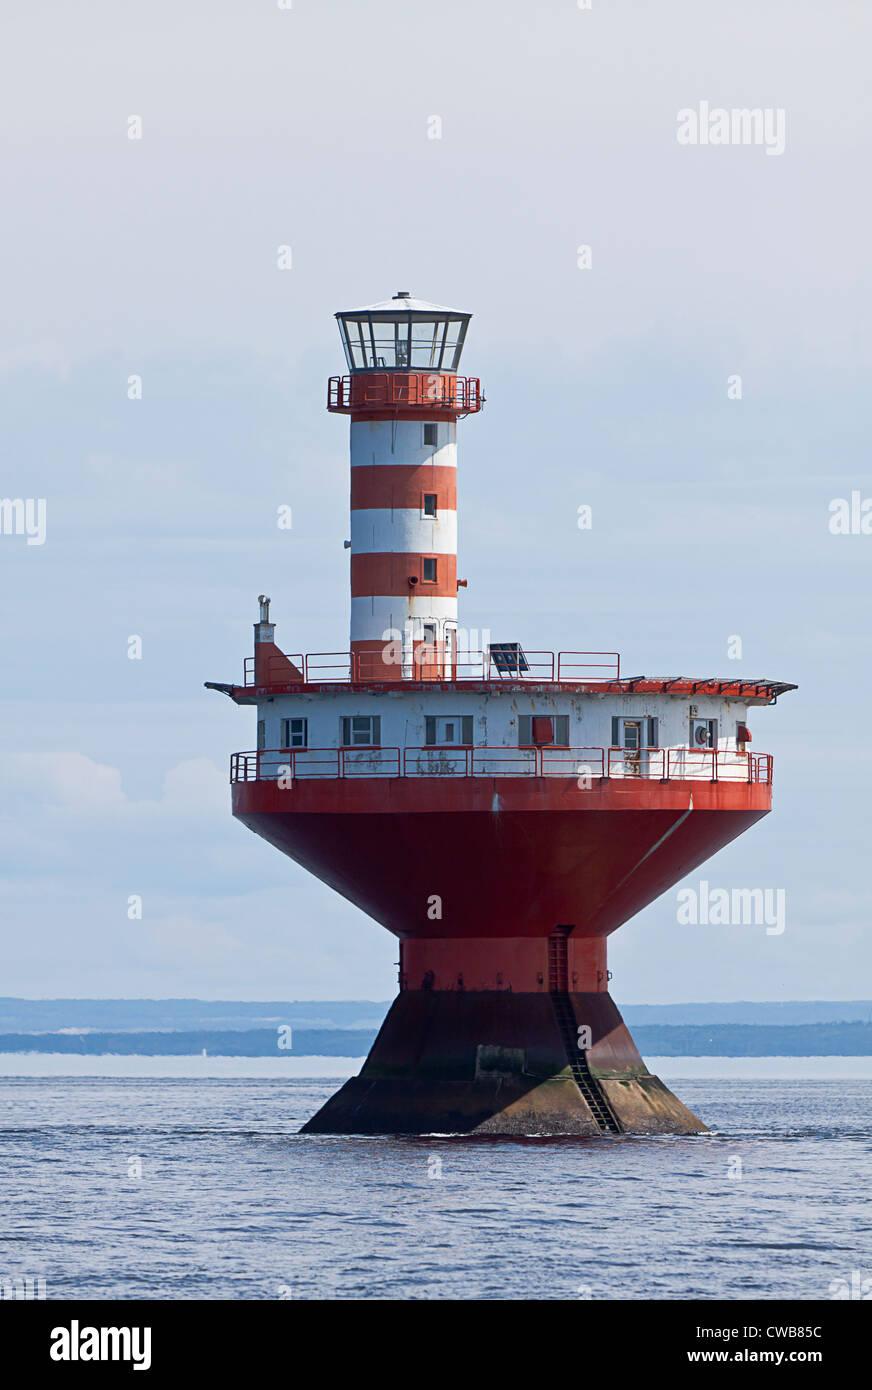 Prince Shoal Lighthouse, Haut-fond Prince Light Tadoussac, Quebec, Canada - Stock Image